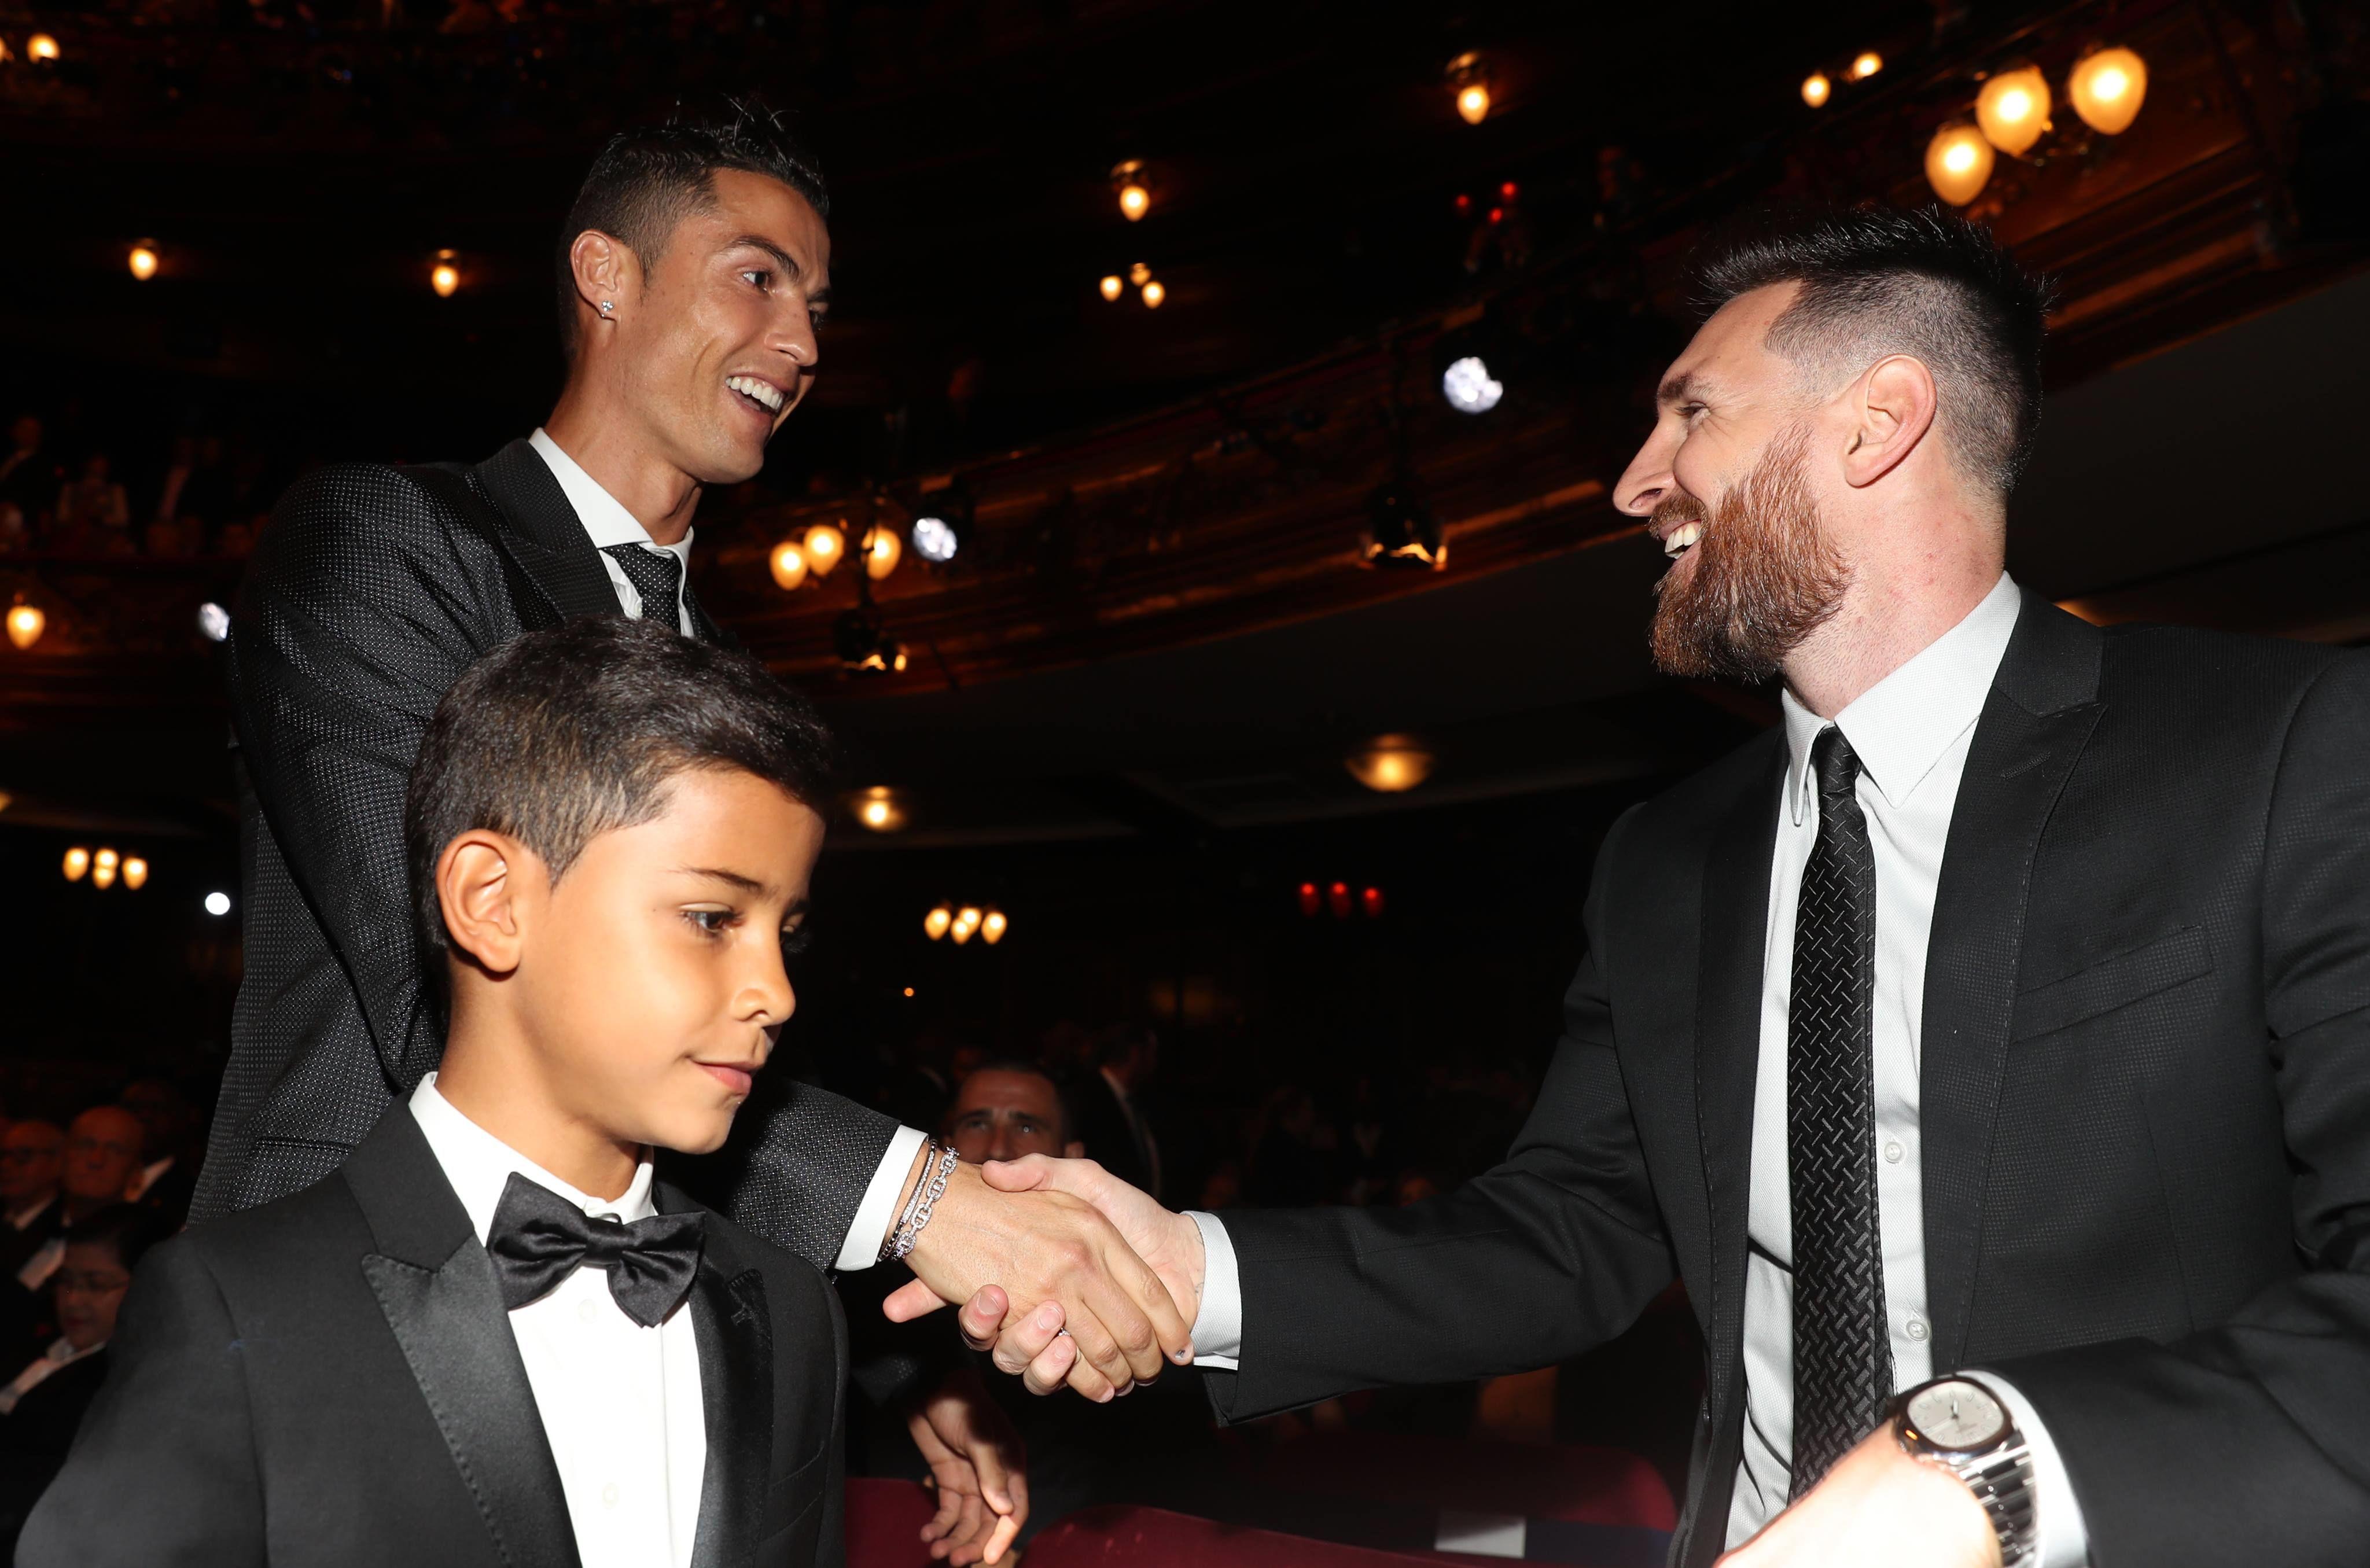 Ronaldo Tidak Masukkan Nama Messi ke Ballon d'Or